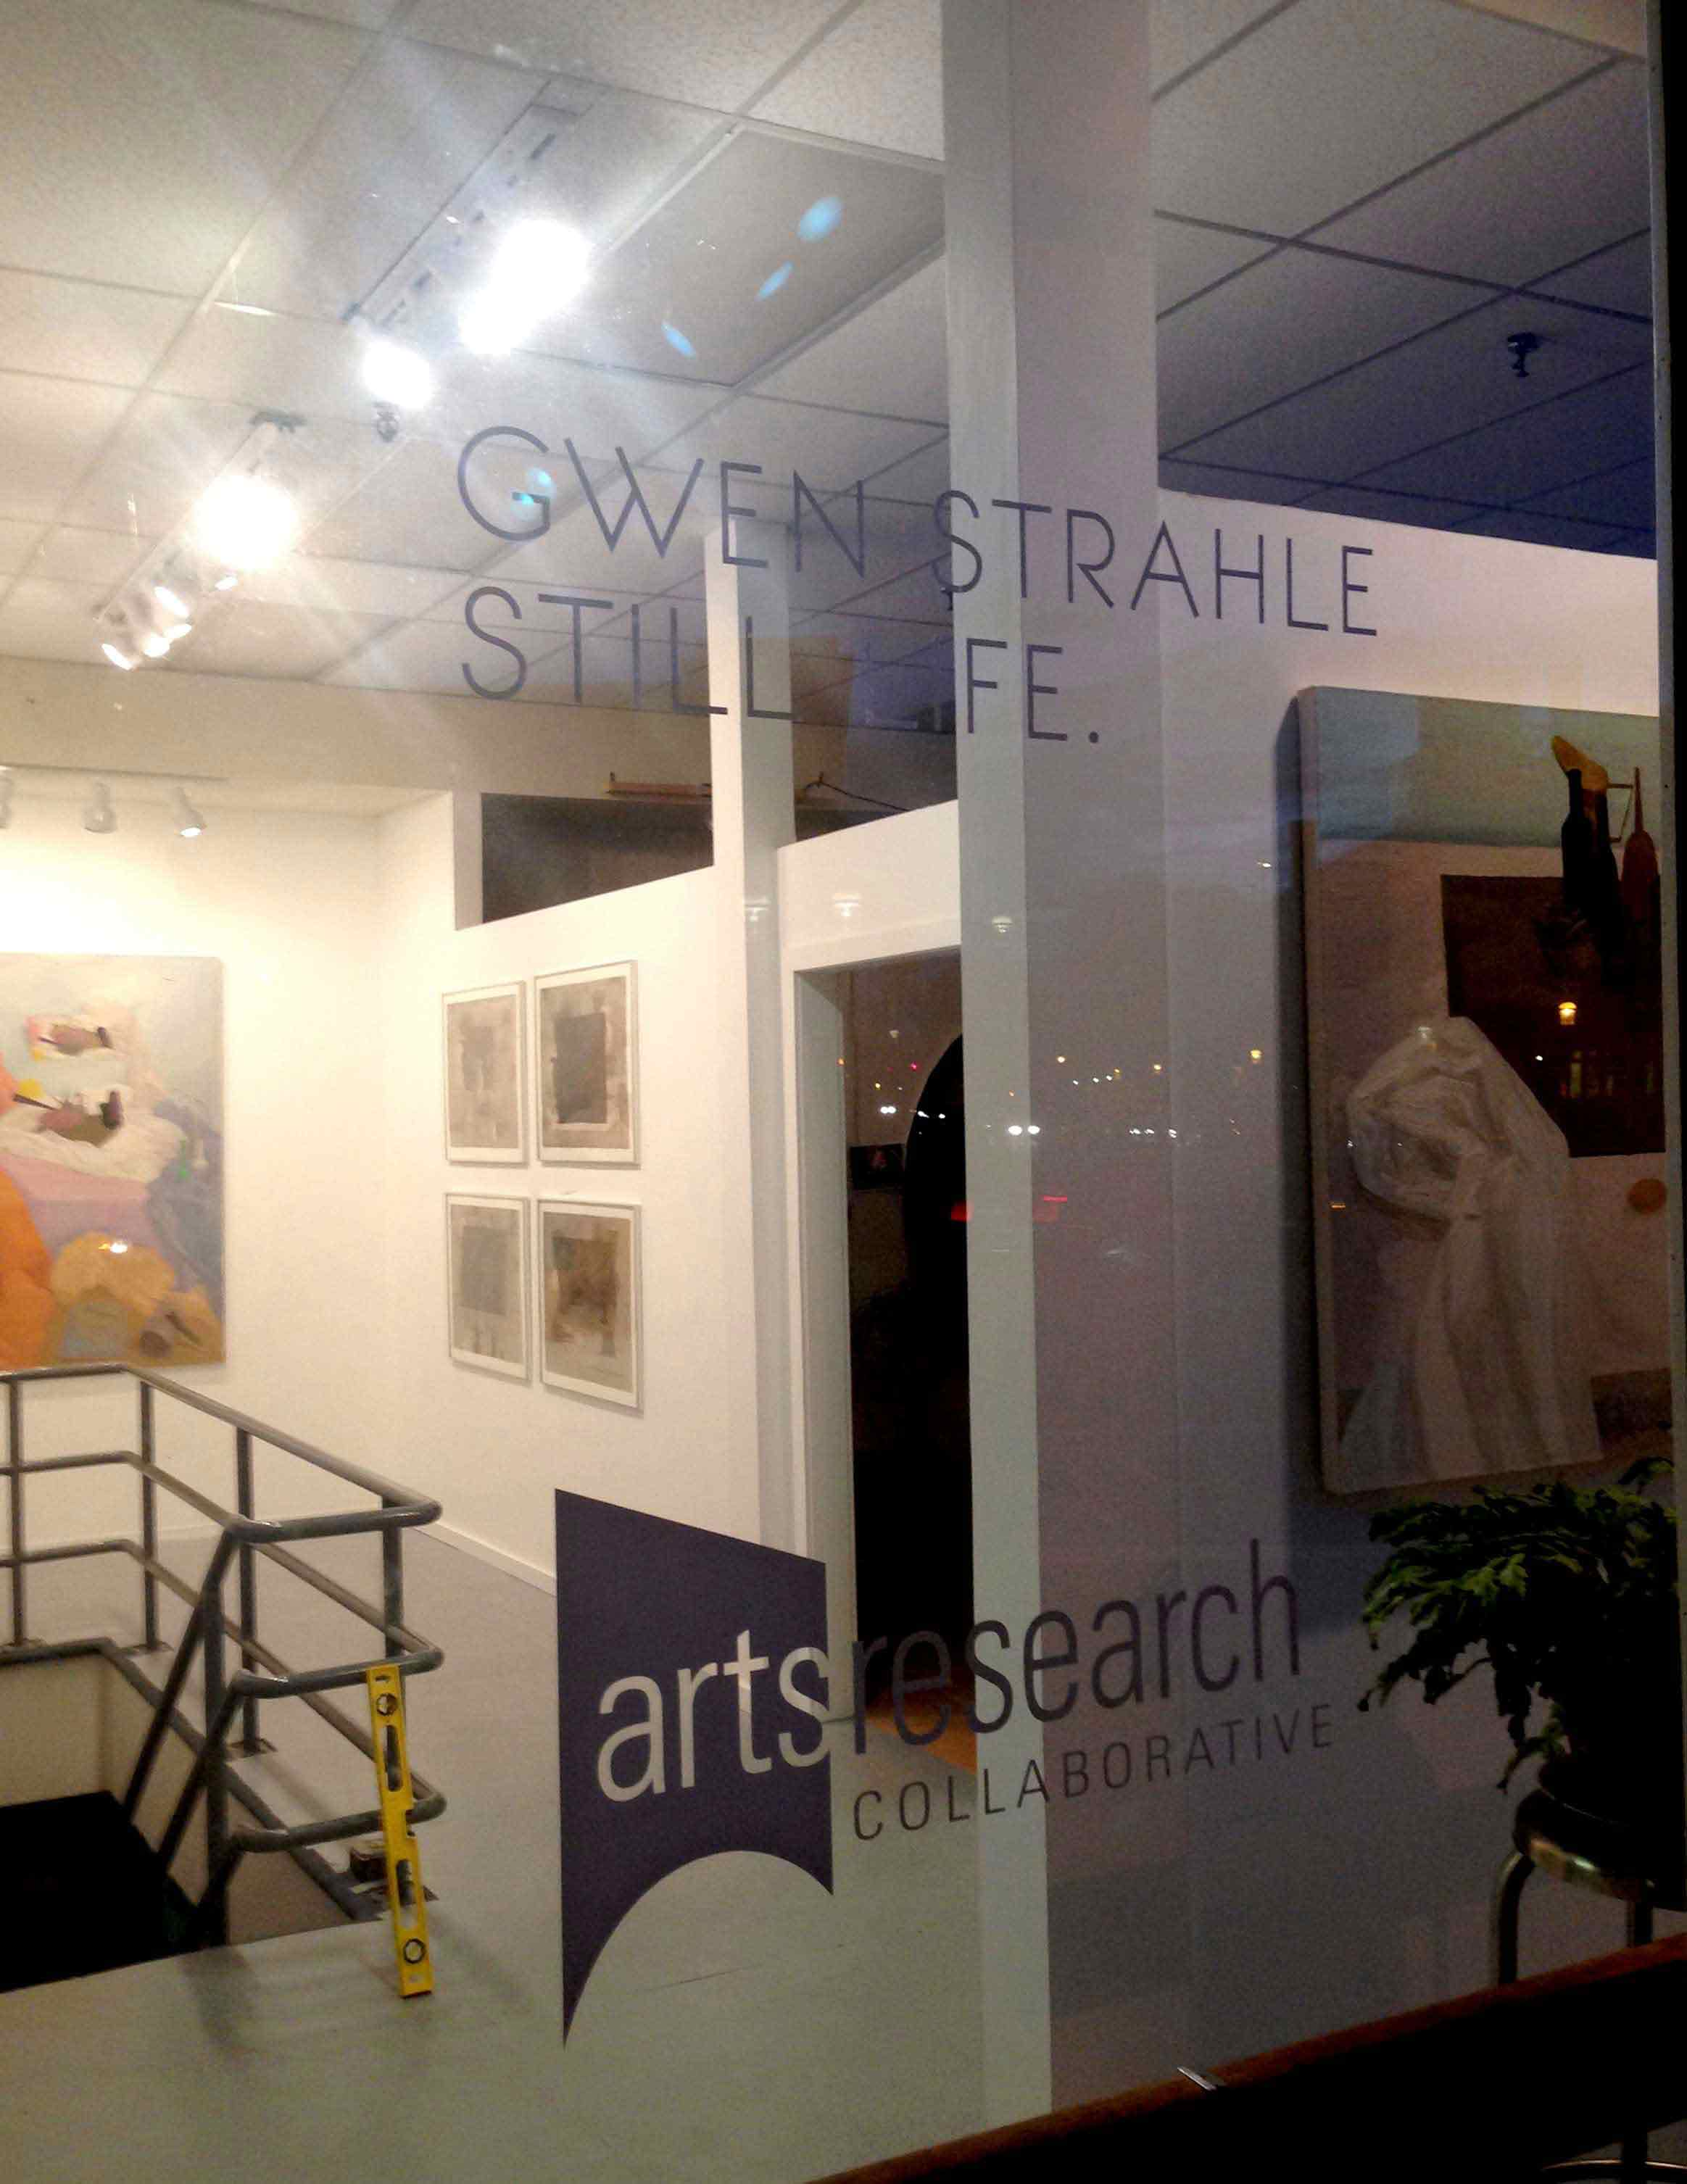 Gwen Strahle Exhibition